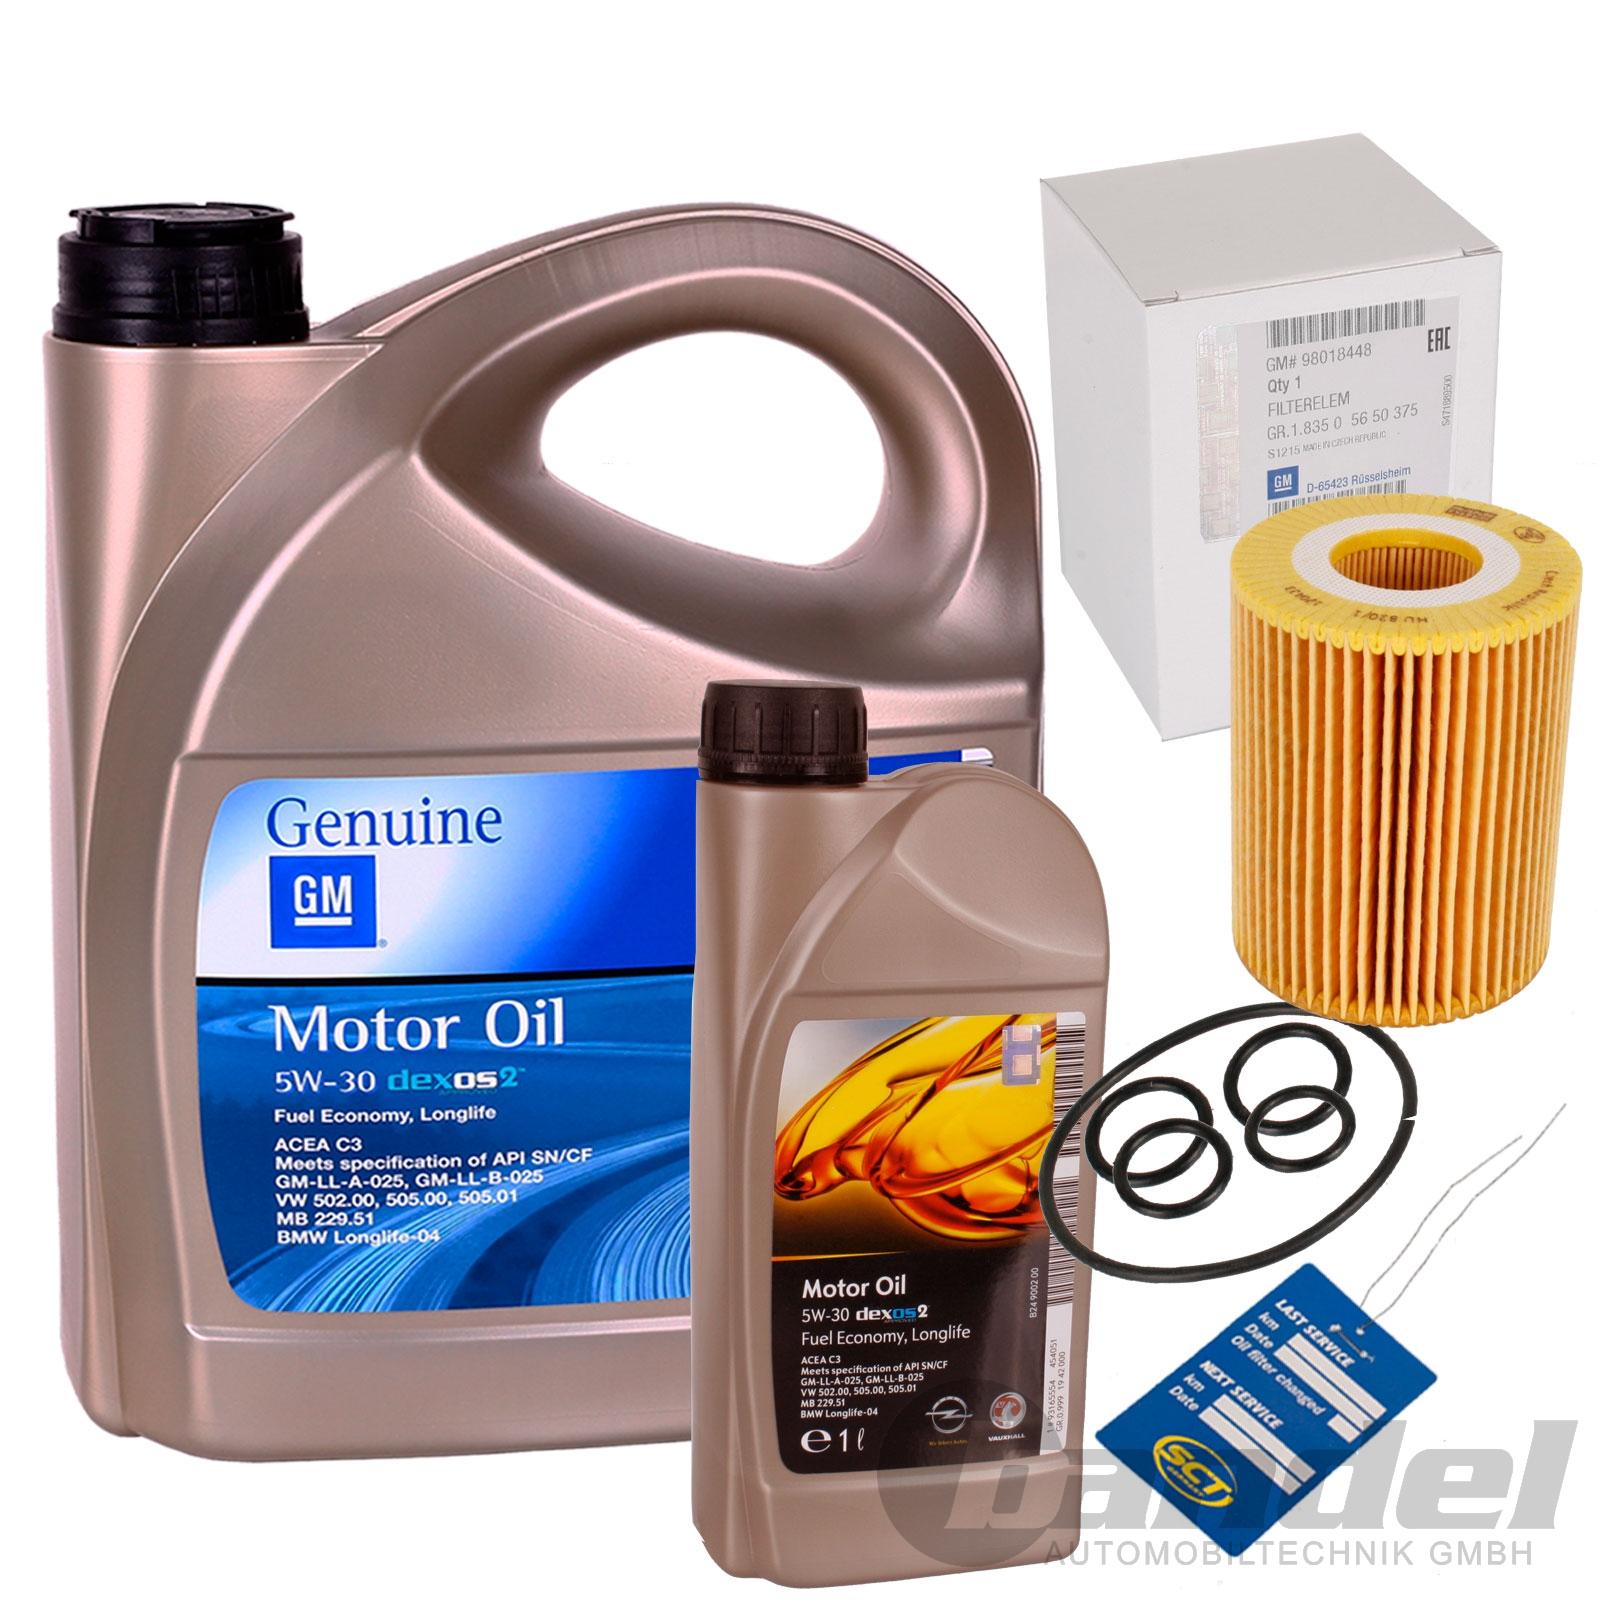 Kraftstofffilter Opel Astra J Ölfilter MANN FILTER Filterpaket Luft Pollen